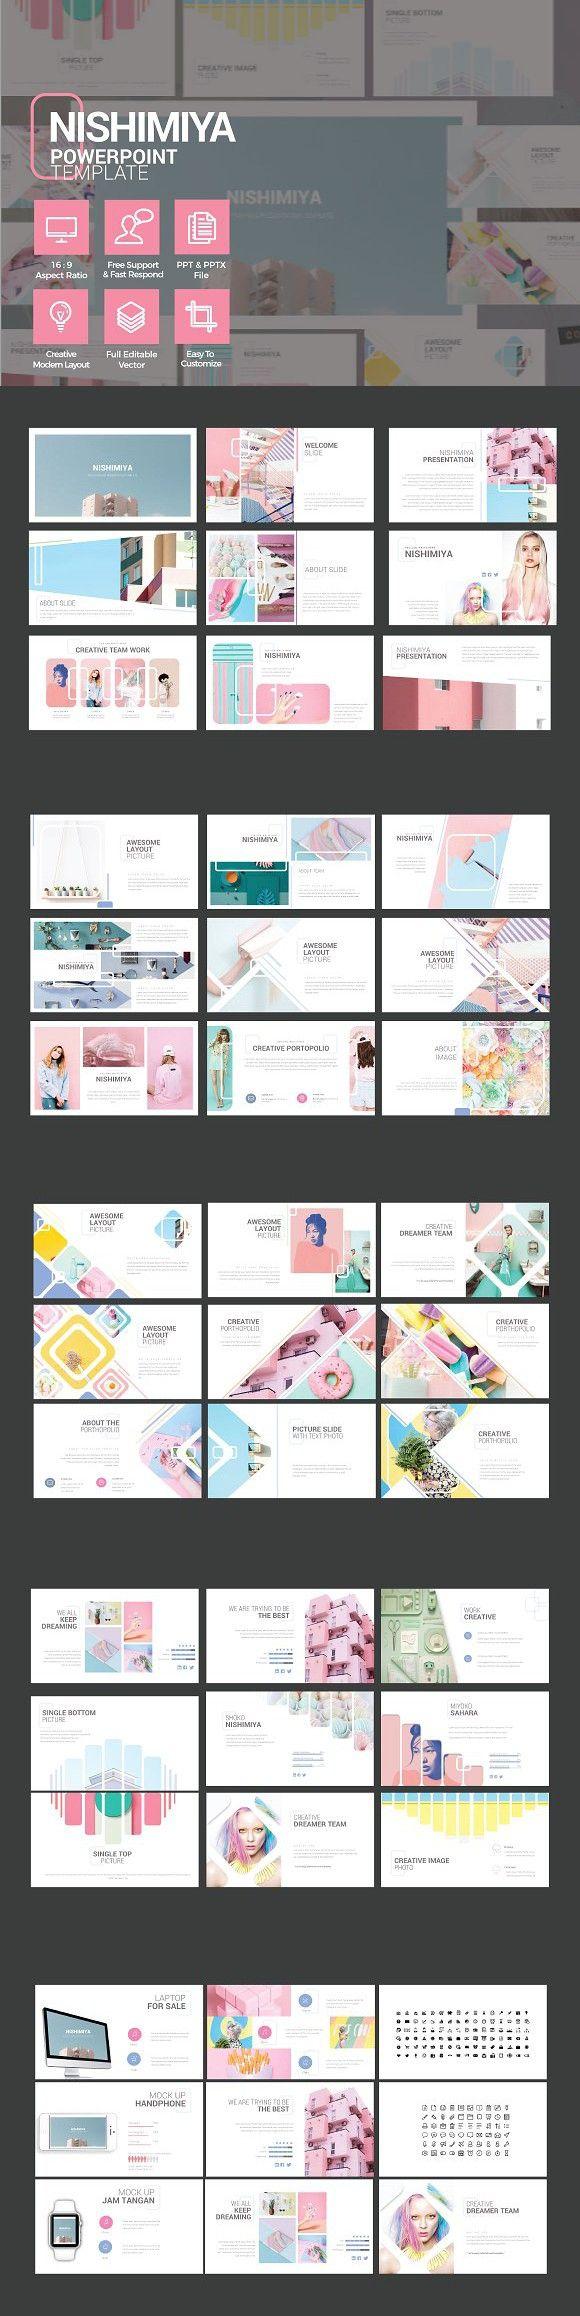 nishimiya multipurpose powerpoint presentation templates